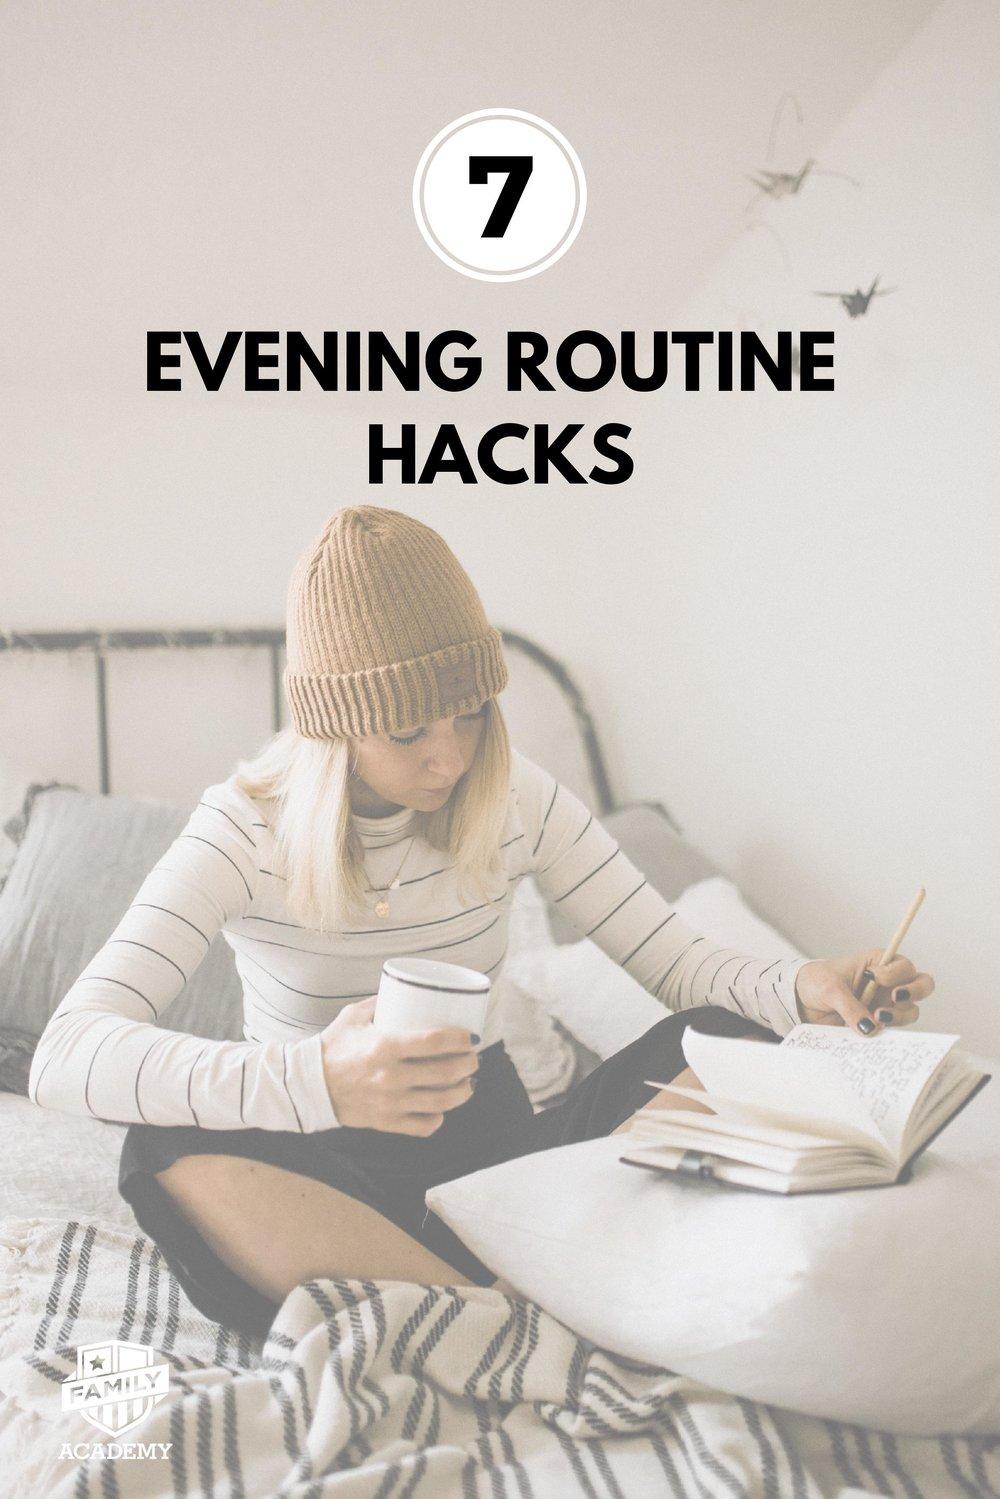 7 Evening Routine Hacks